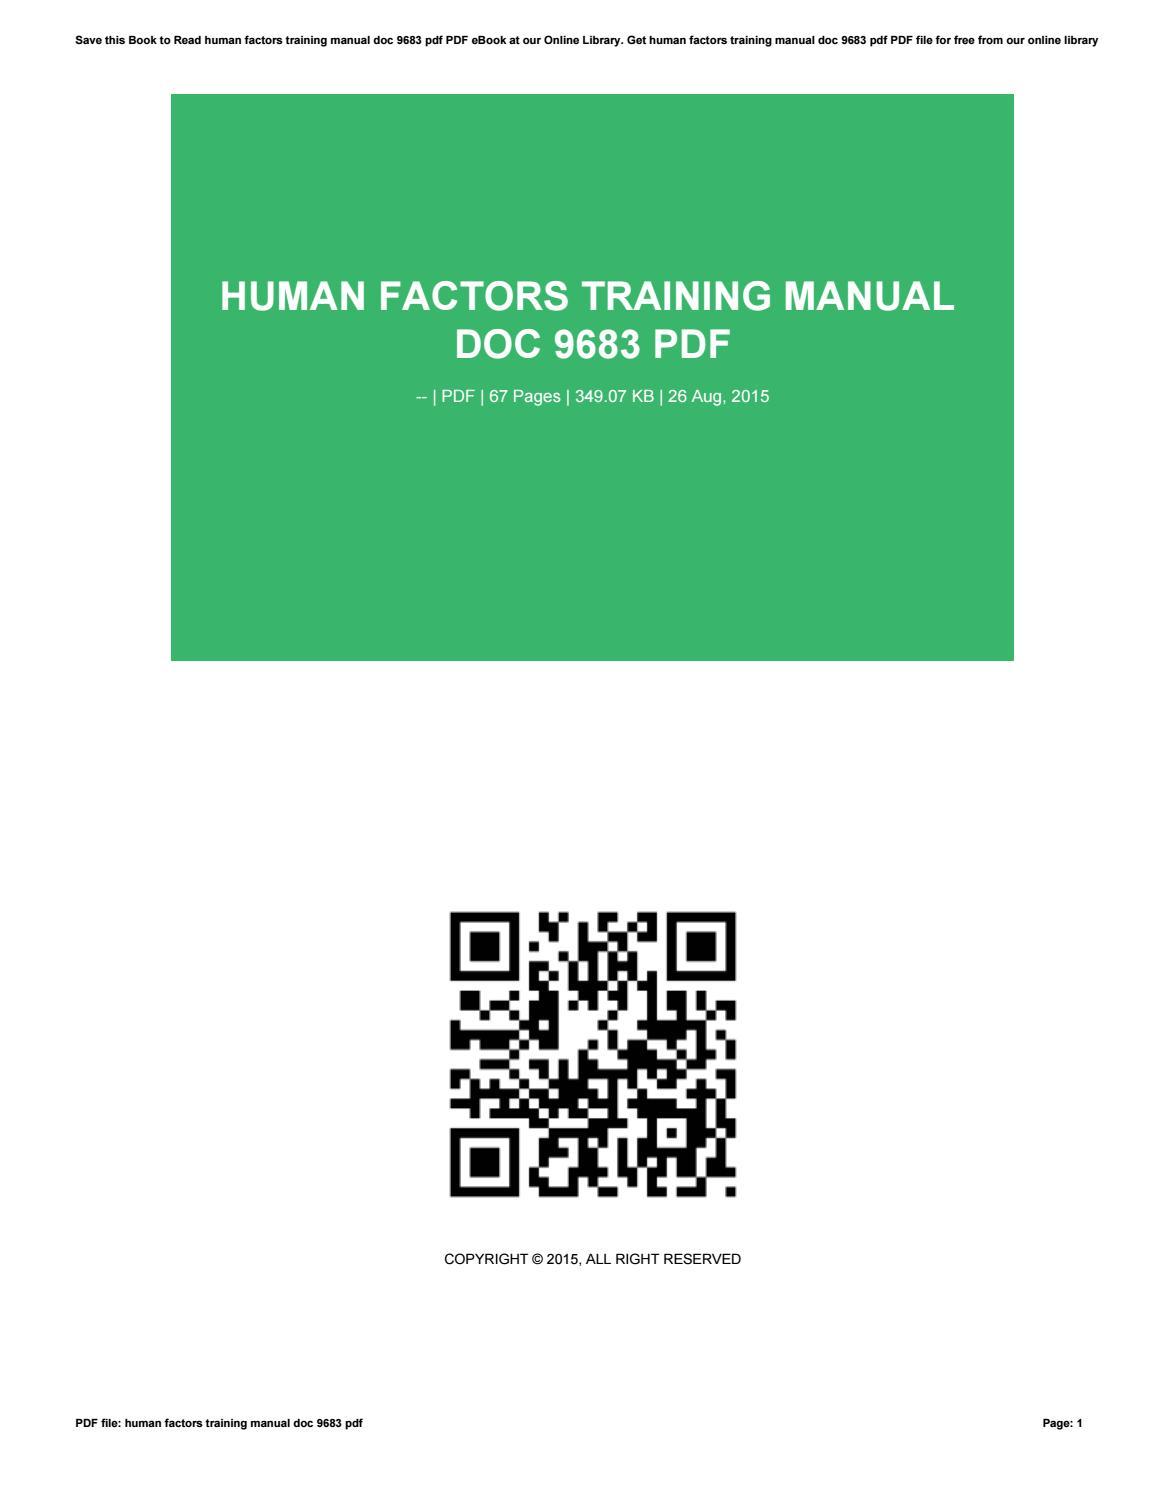 human factors training manual doc 9683 pdf by kotsu0184 issuu rh issuu com icao  human factors training manual doc 9683 pdf icao human factors training ...